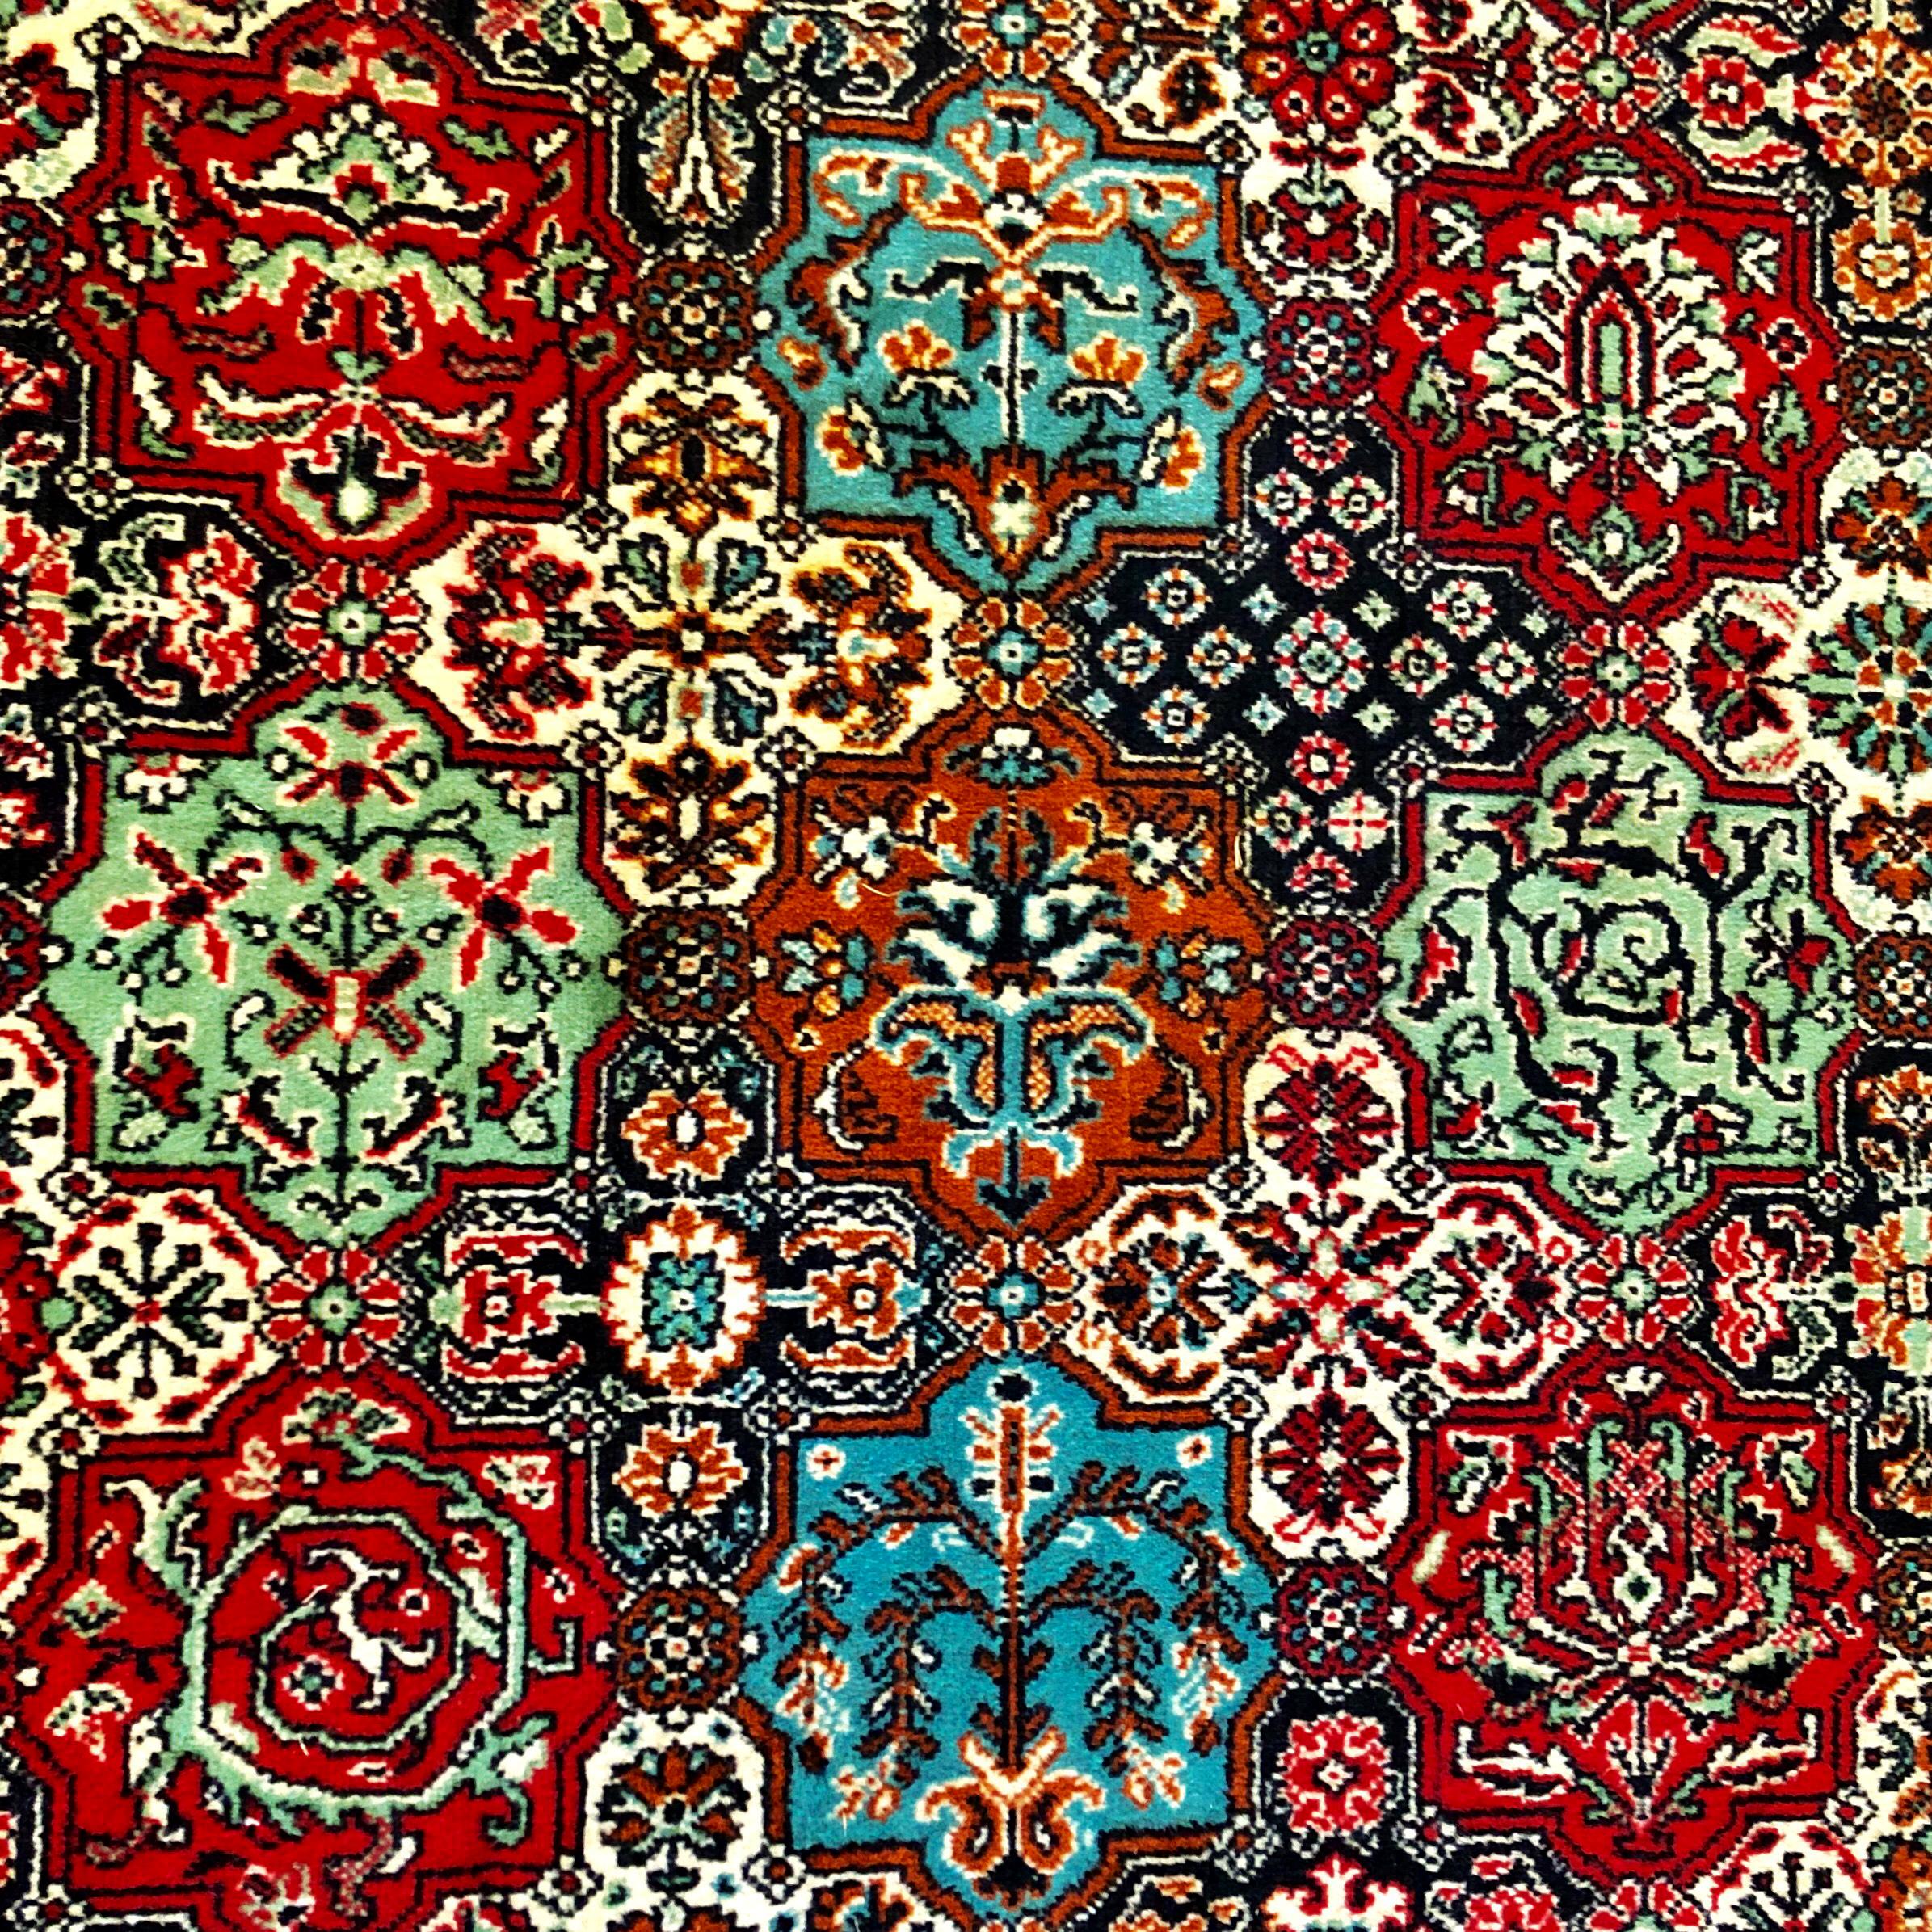 vintage-rug-square-instagram.jpg